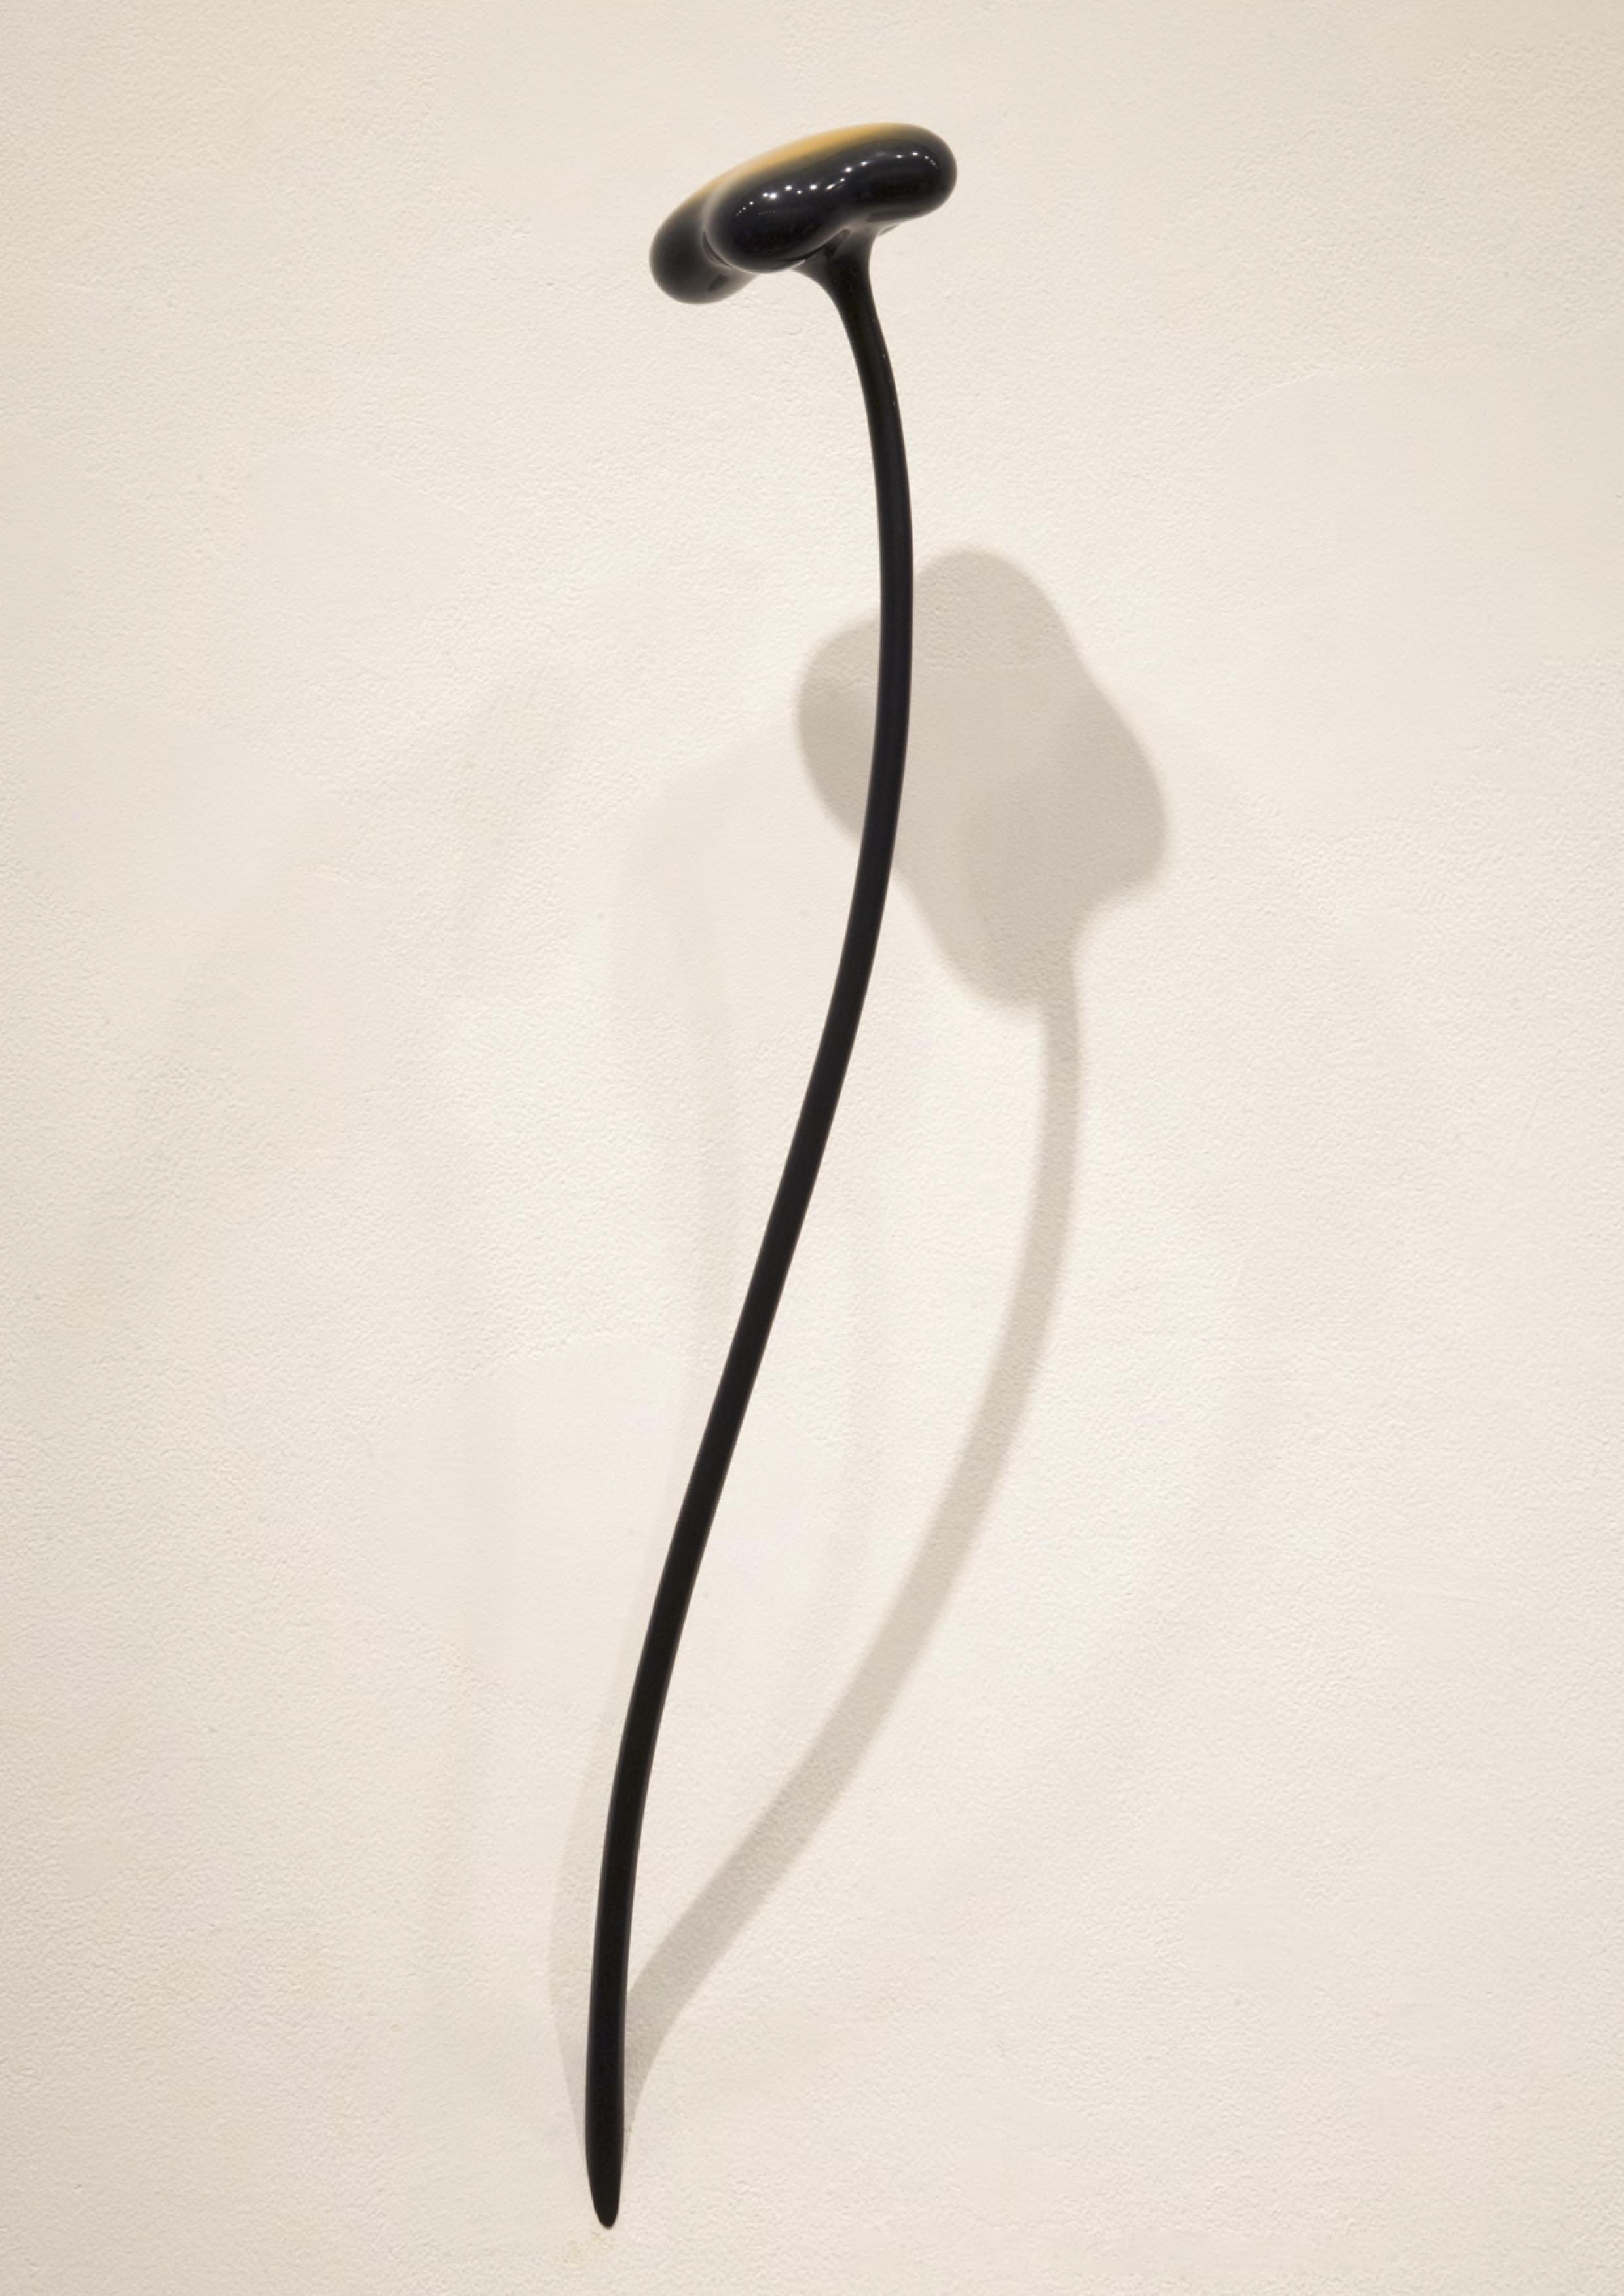 MOMOSE Reia - Urushi, kanshitsu dry-lacquer technique, sculpture